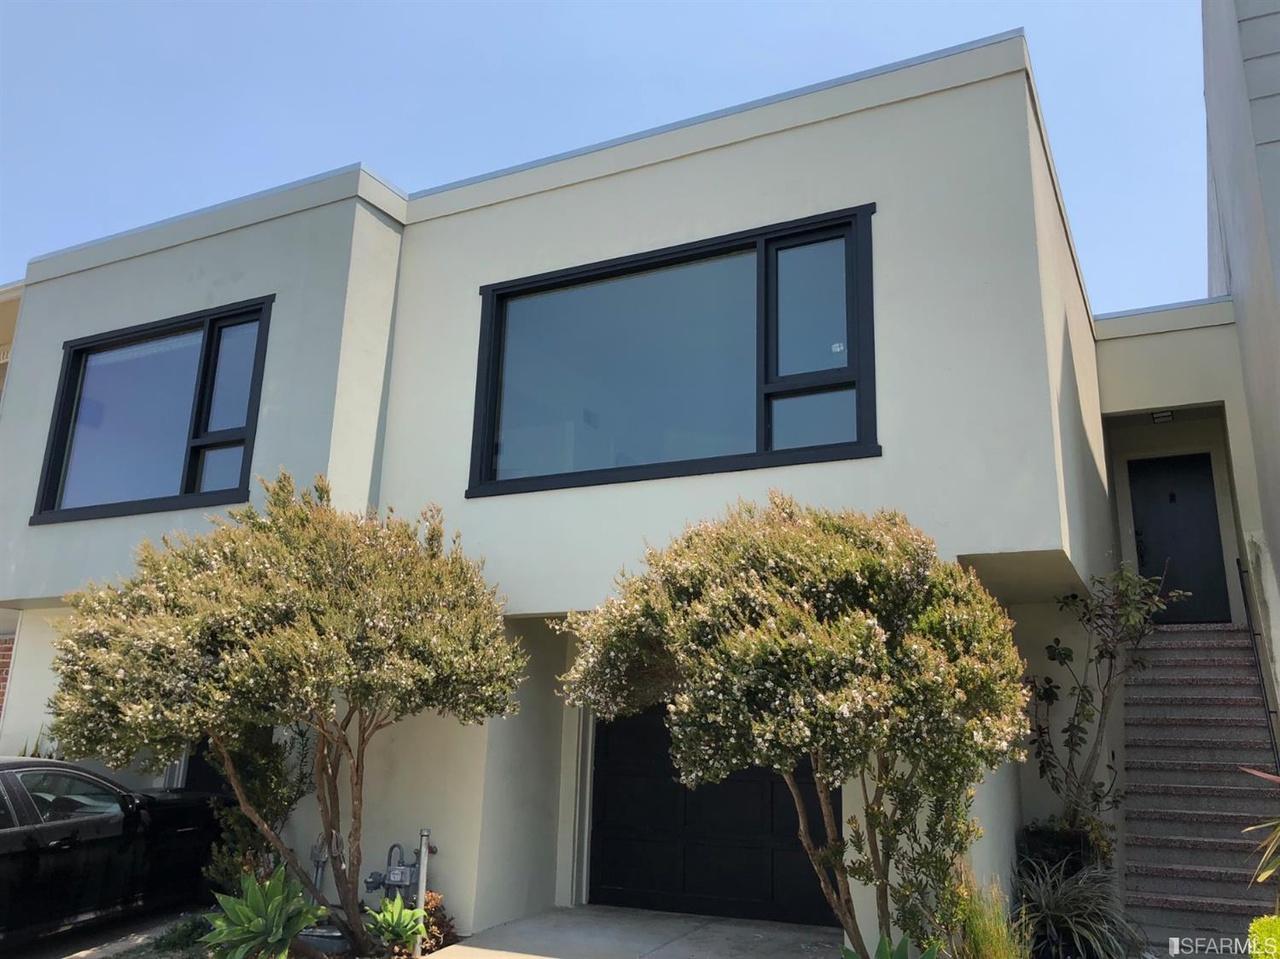 18 Manzanita Ave, San Francisco, CA 94118 | MLS# 474477 | Redfin